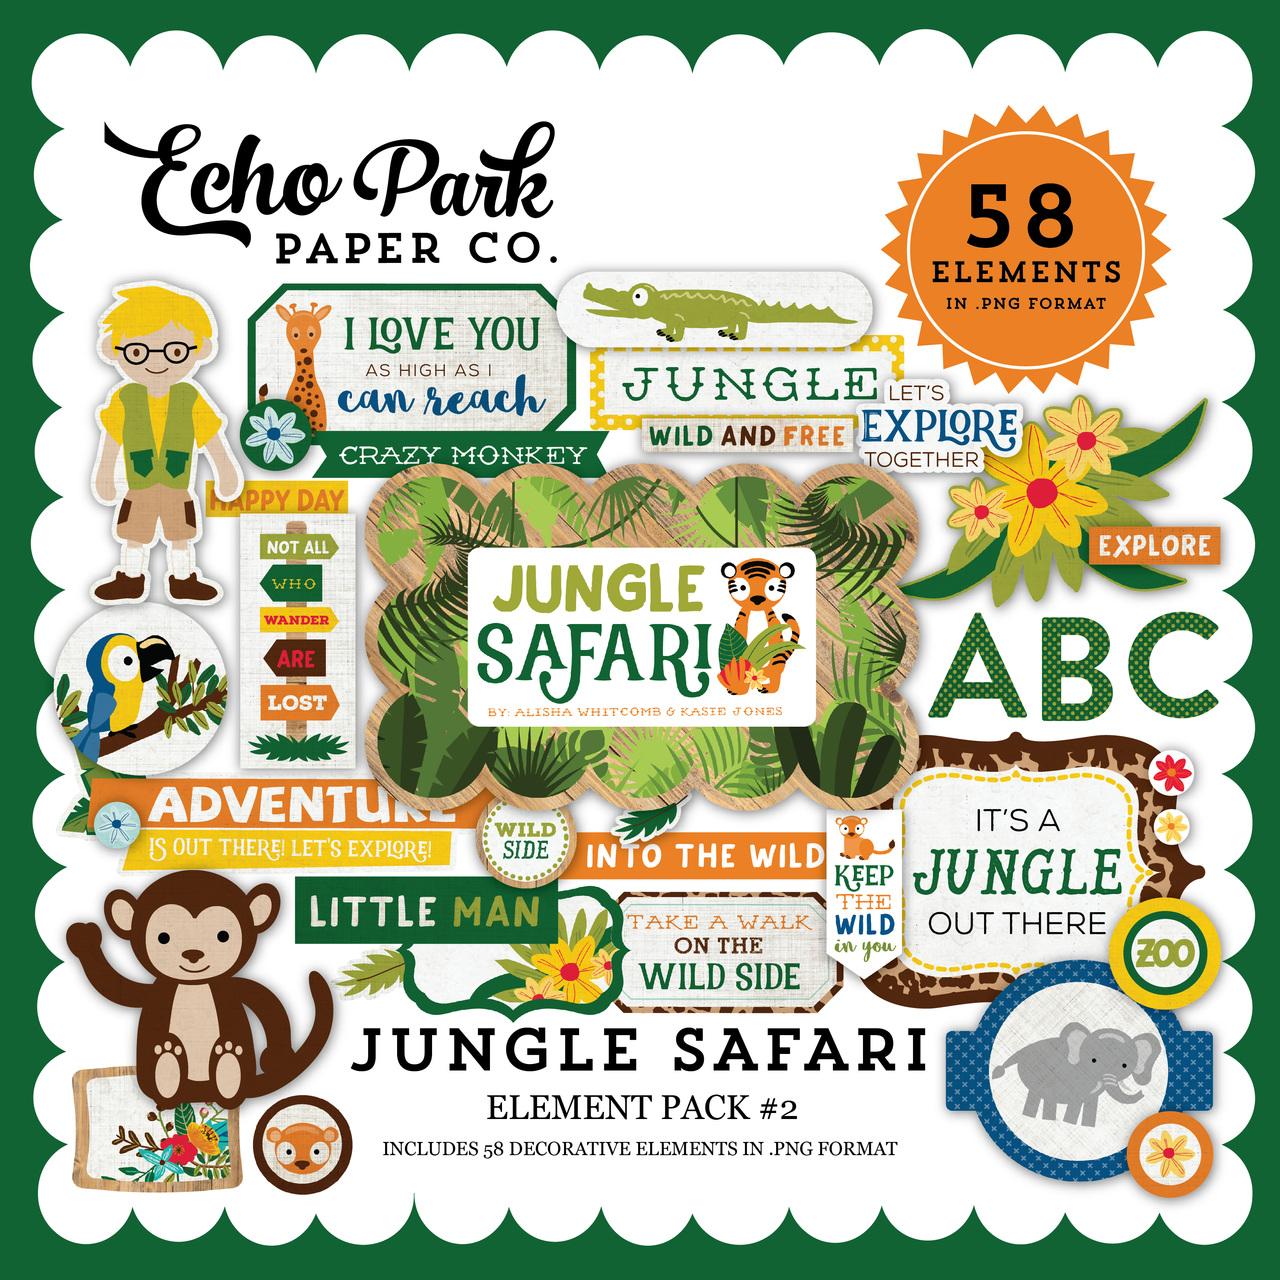 Jungle Safari Element Pack #2